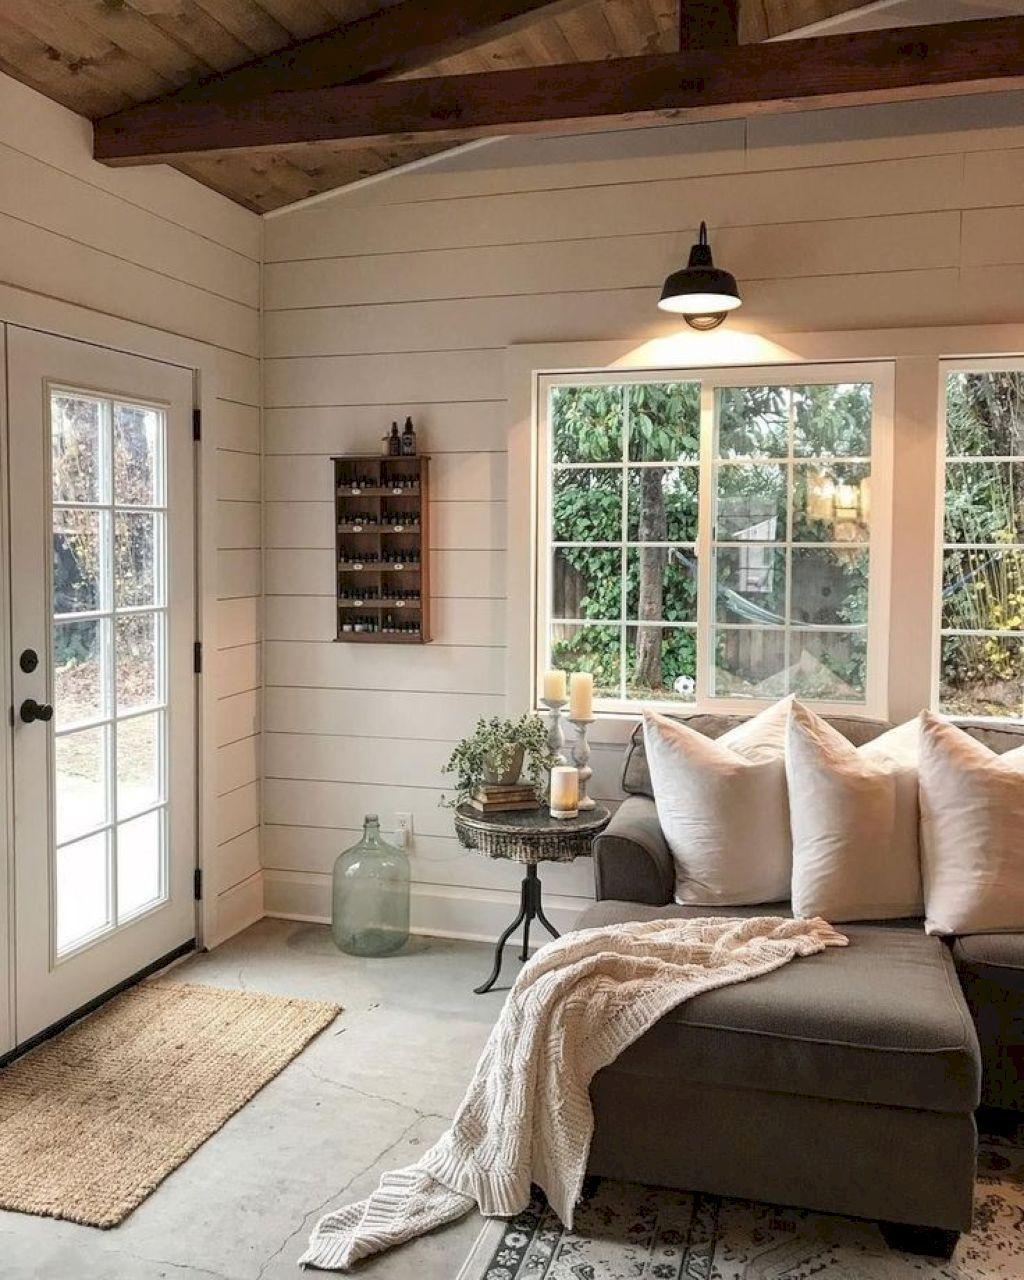 65 Rustic Farmhouse Living Room Design and Decor Ideas images